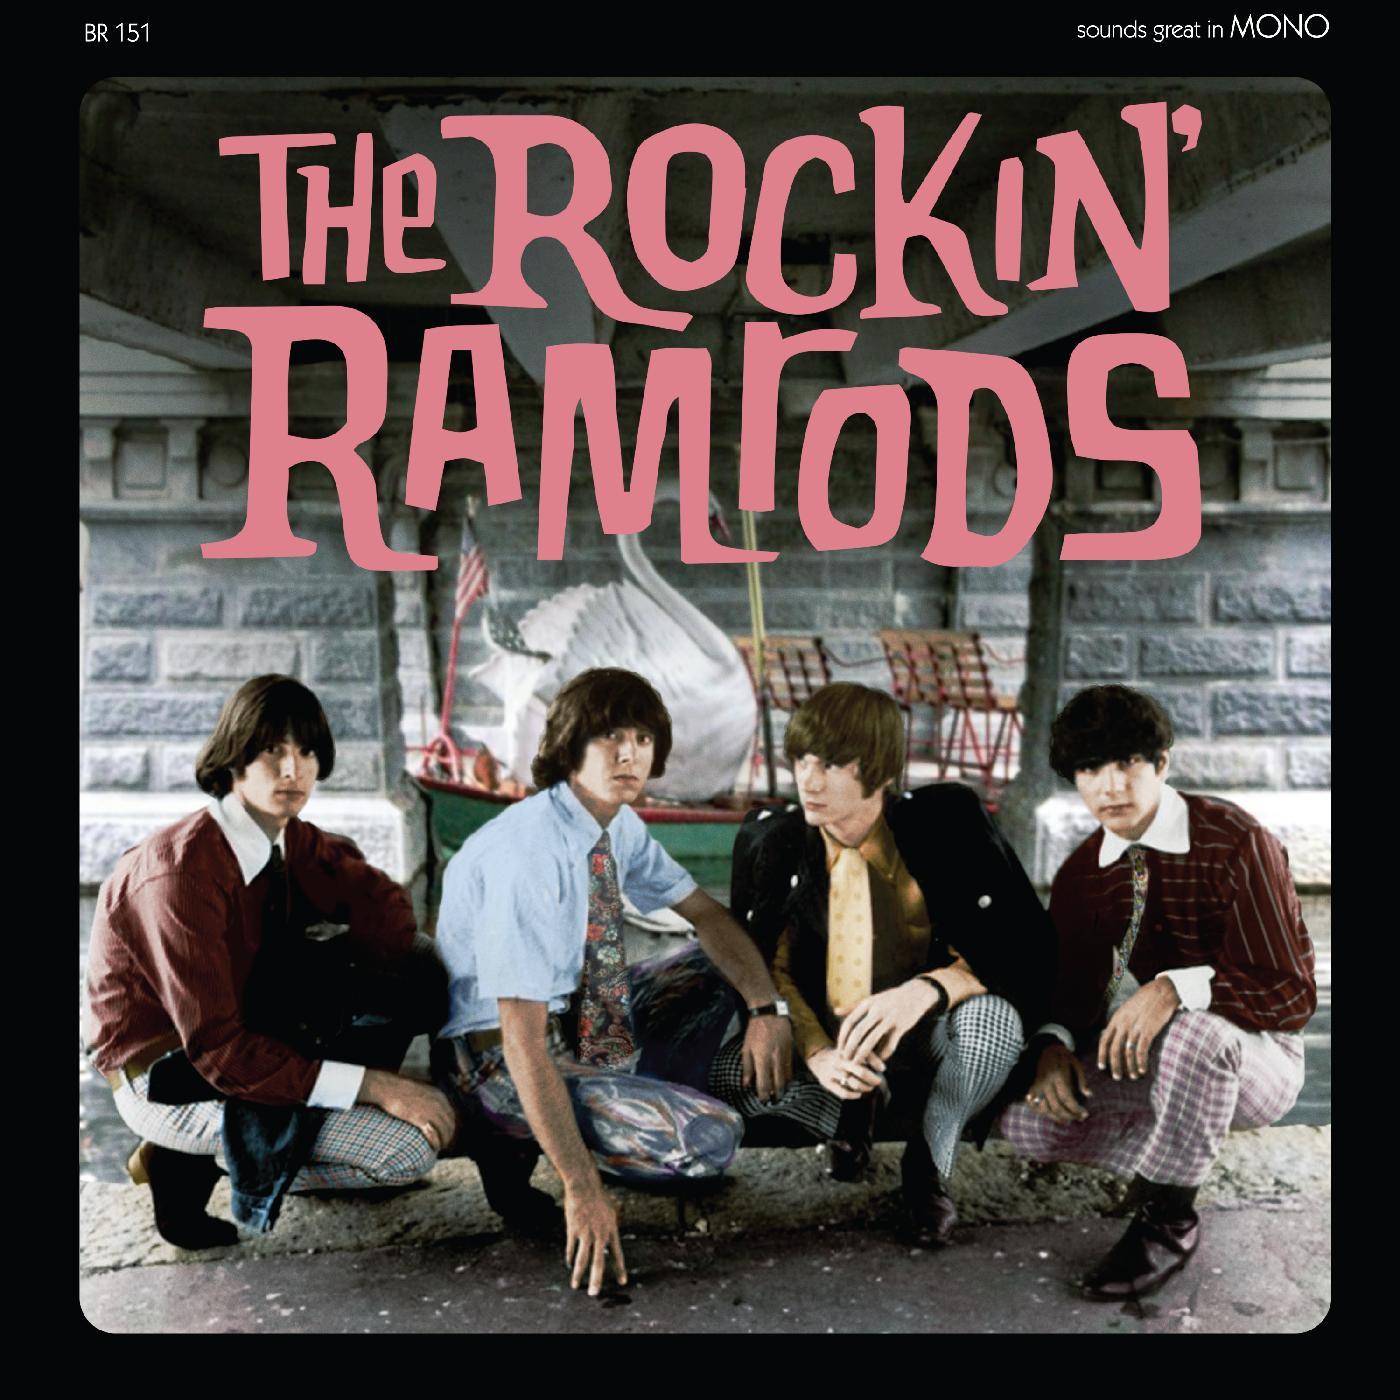 Rockin Ramrods, The - The Rockin Ramrods - LP